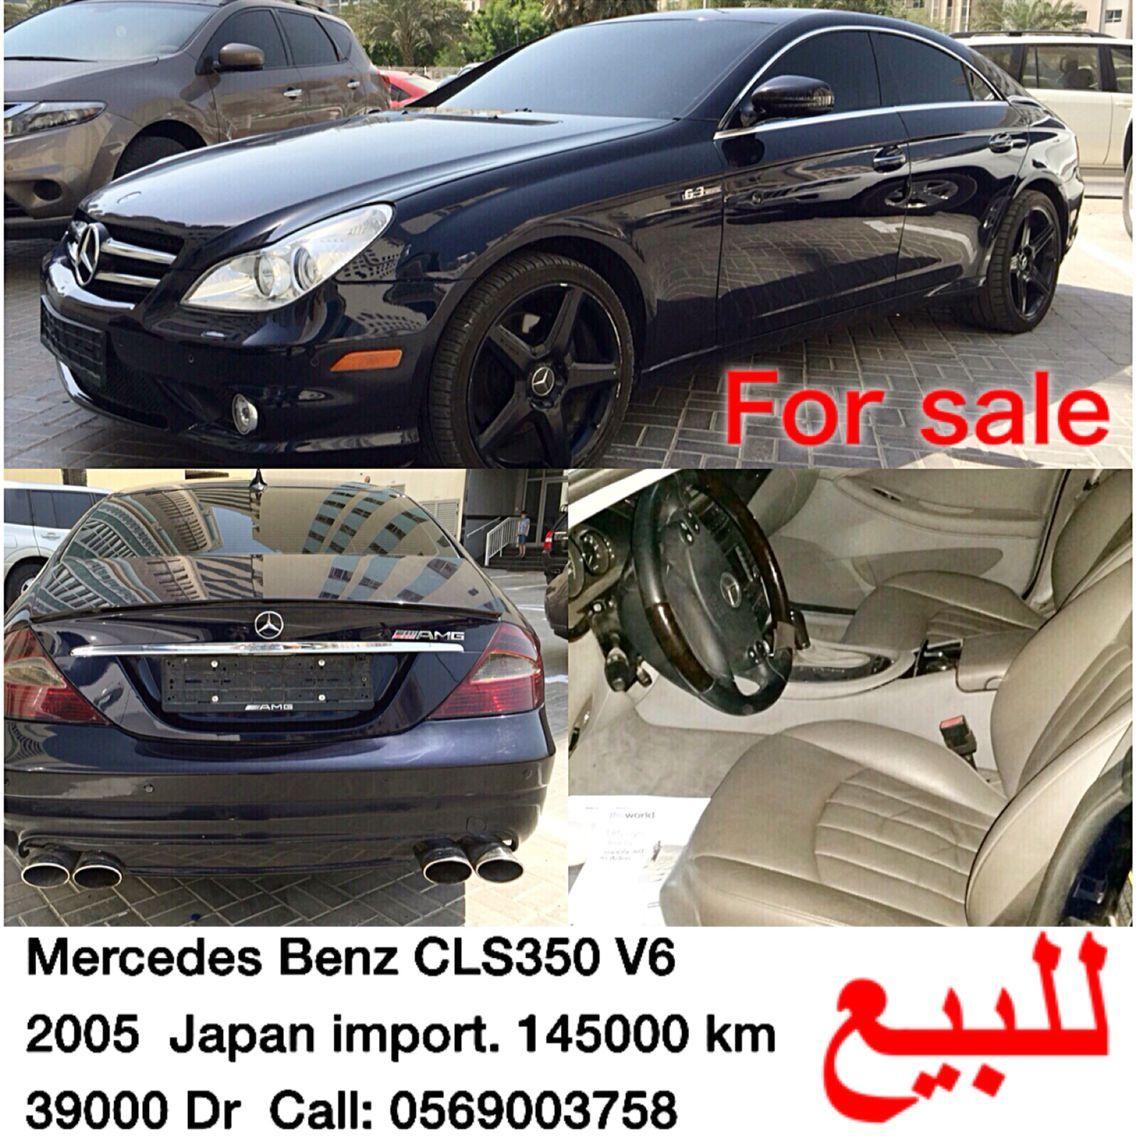 Mercedes Benz Cls350 V6 2005 Japan Import 145000 Km 39000 Dr Call 0569003758 اعلان Vip مرسيدس مرسدس الواتساب Uae4cars2 Mercedes Benz Benz Mercedes